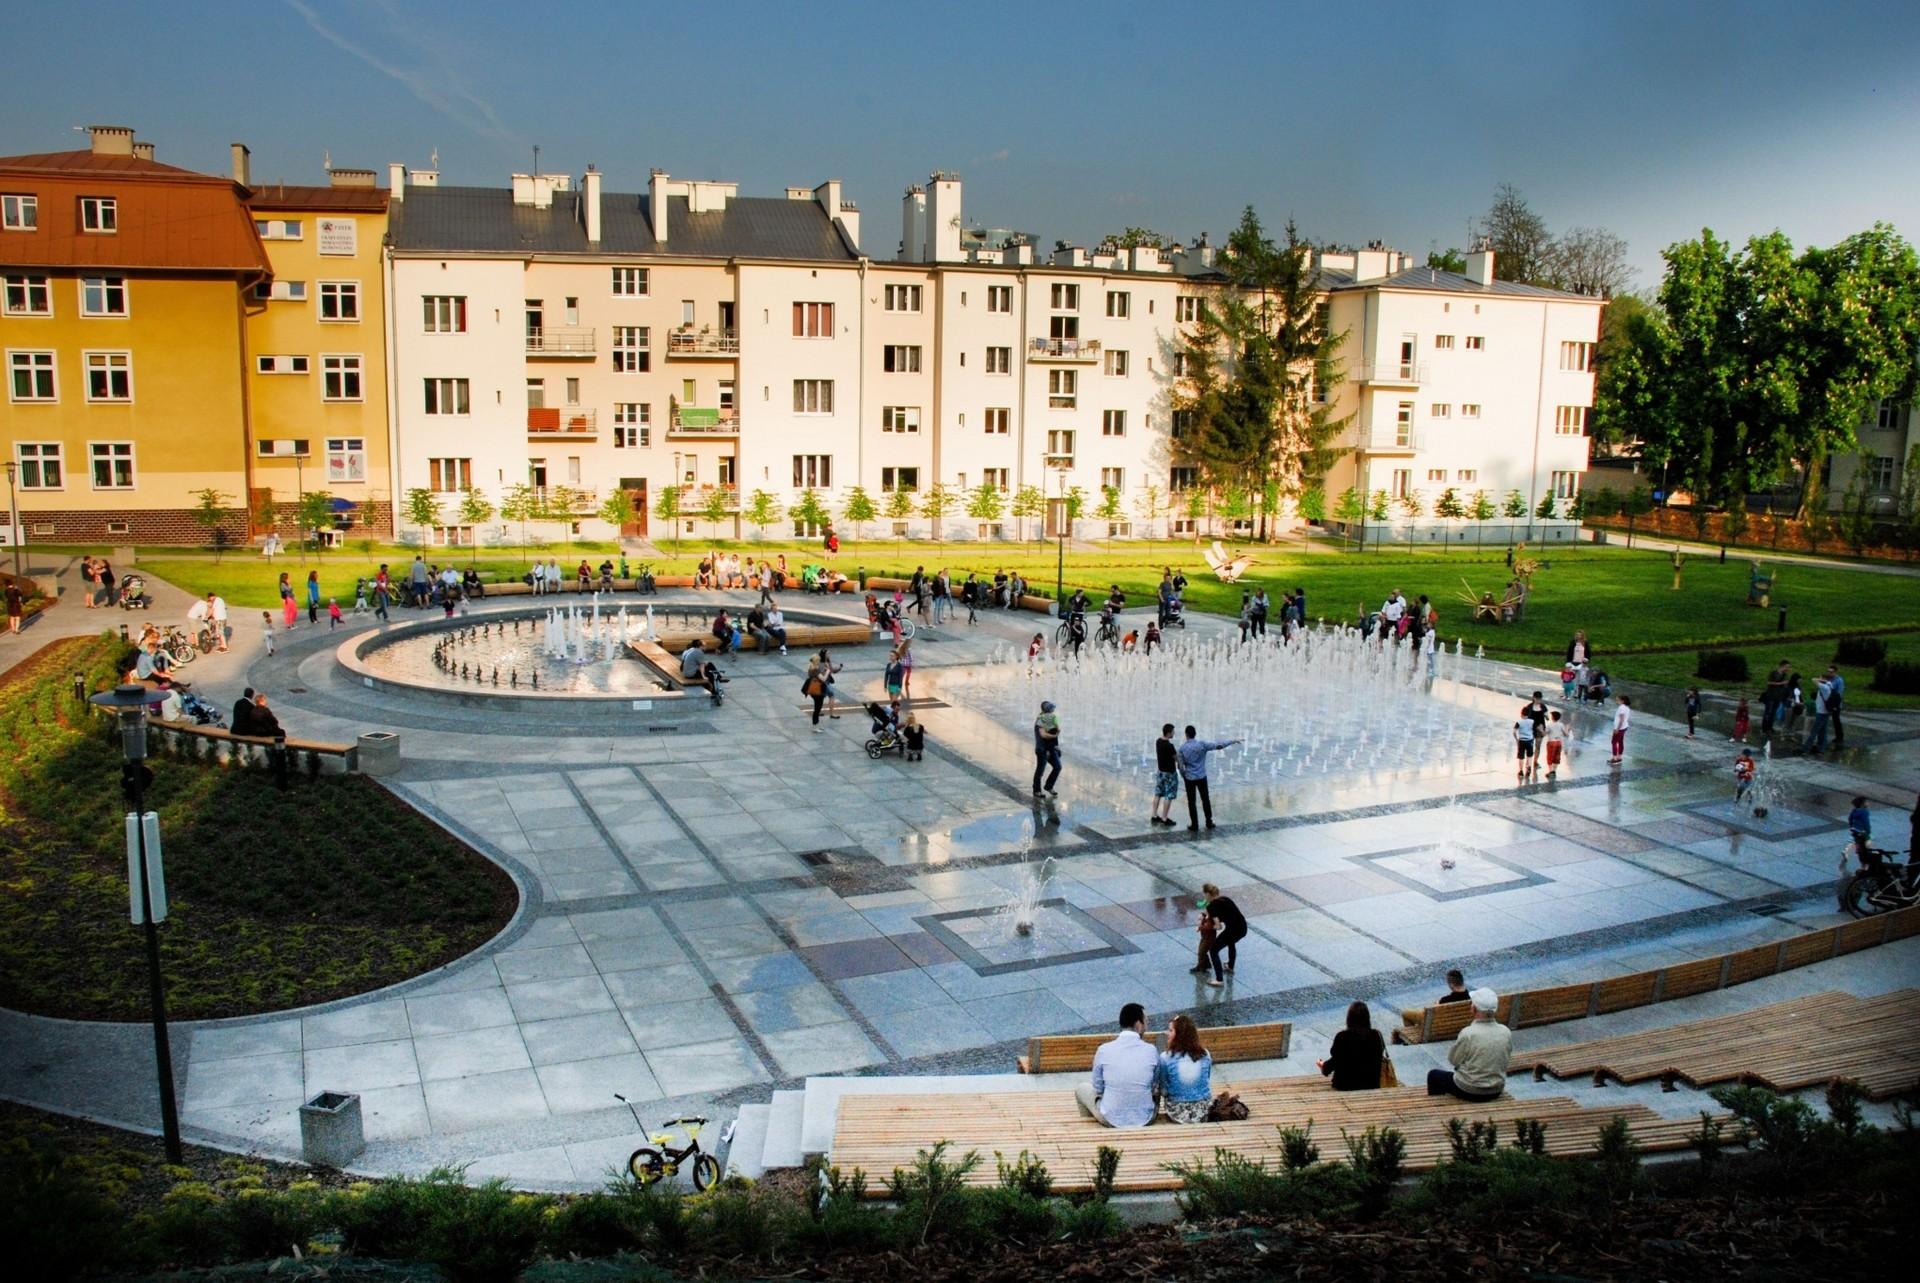 Esperienza a Rzeszow, Polonia di Aneta